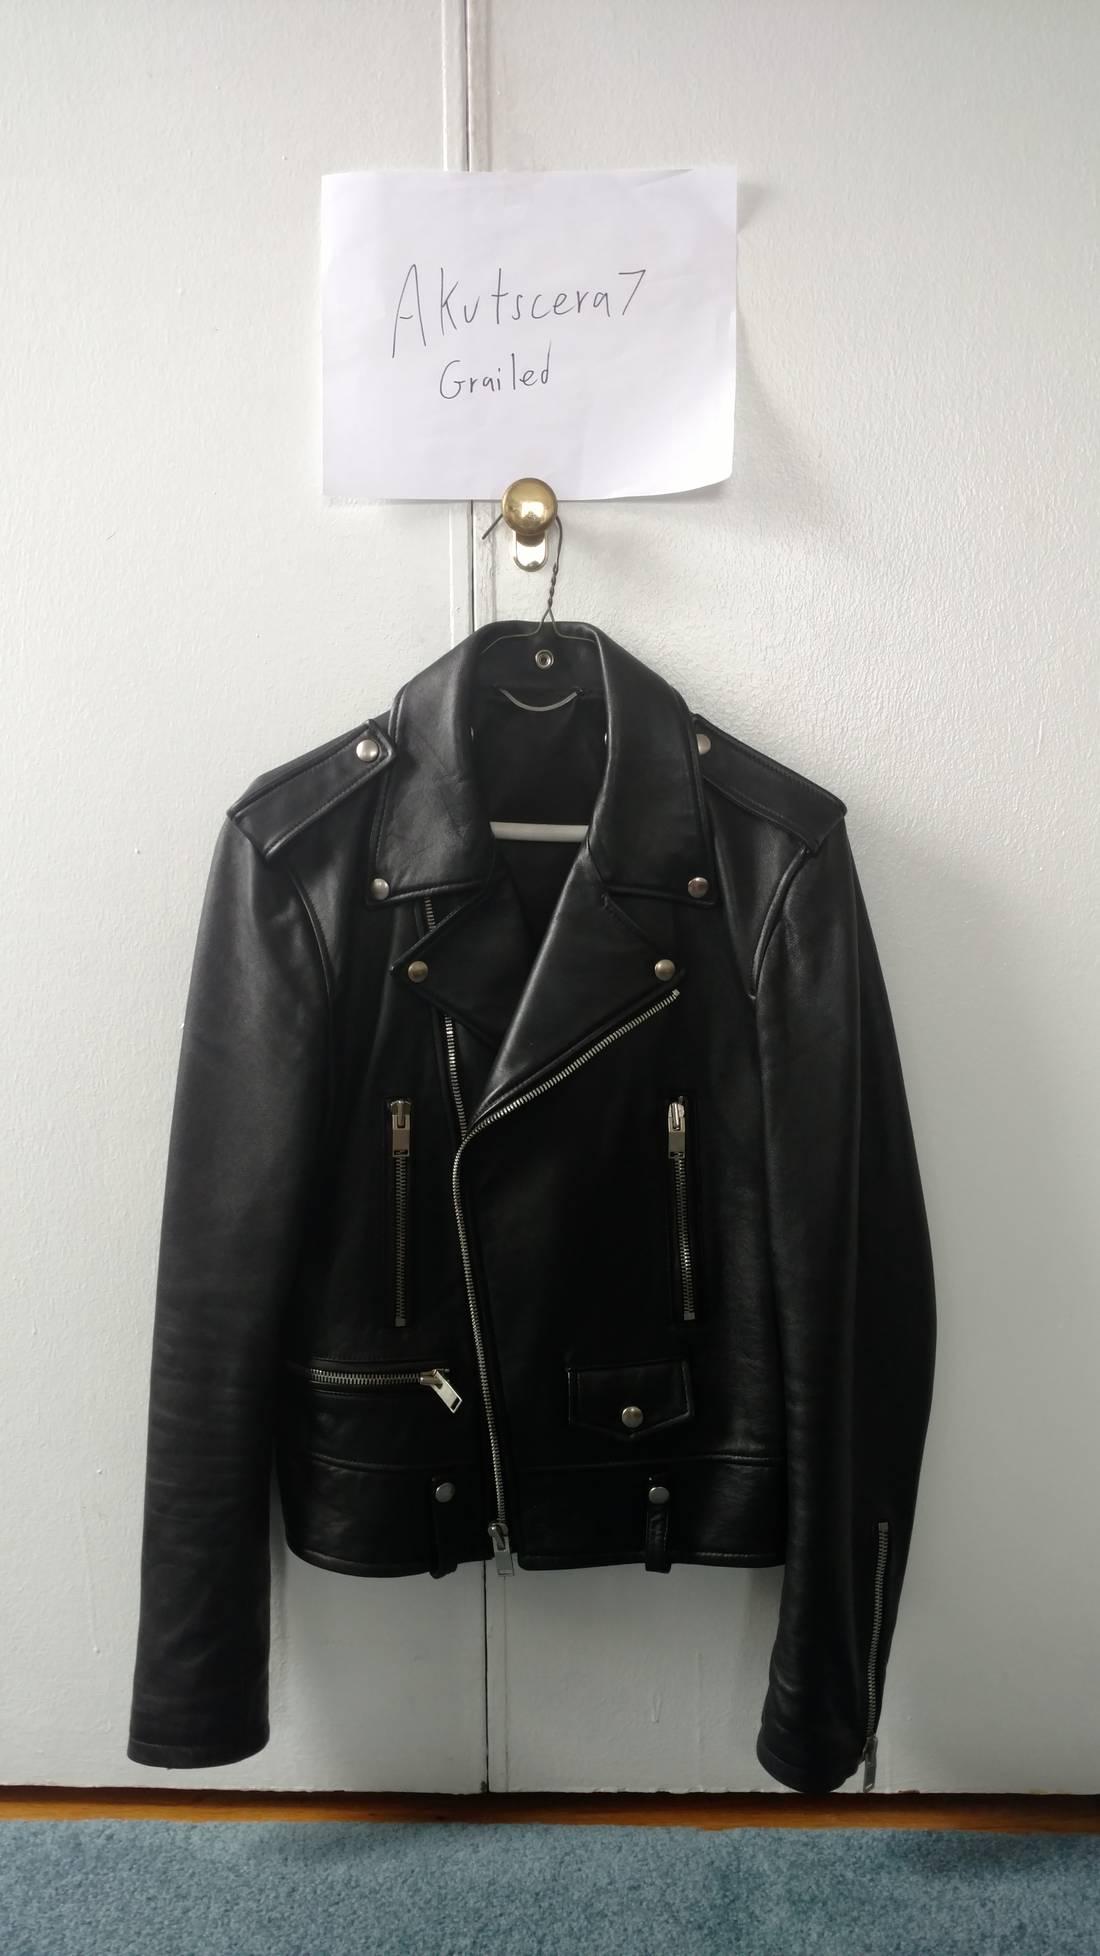 9c999e4cf Gucci Bomber Jacket Mens Fake | Toffee Art